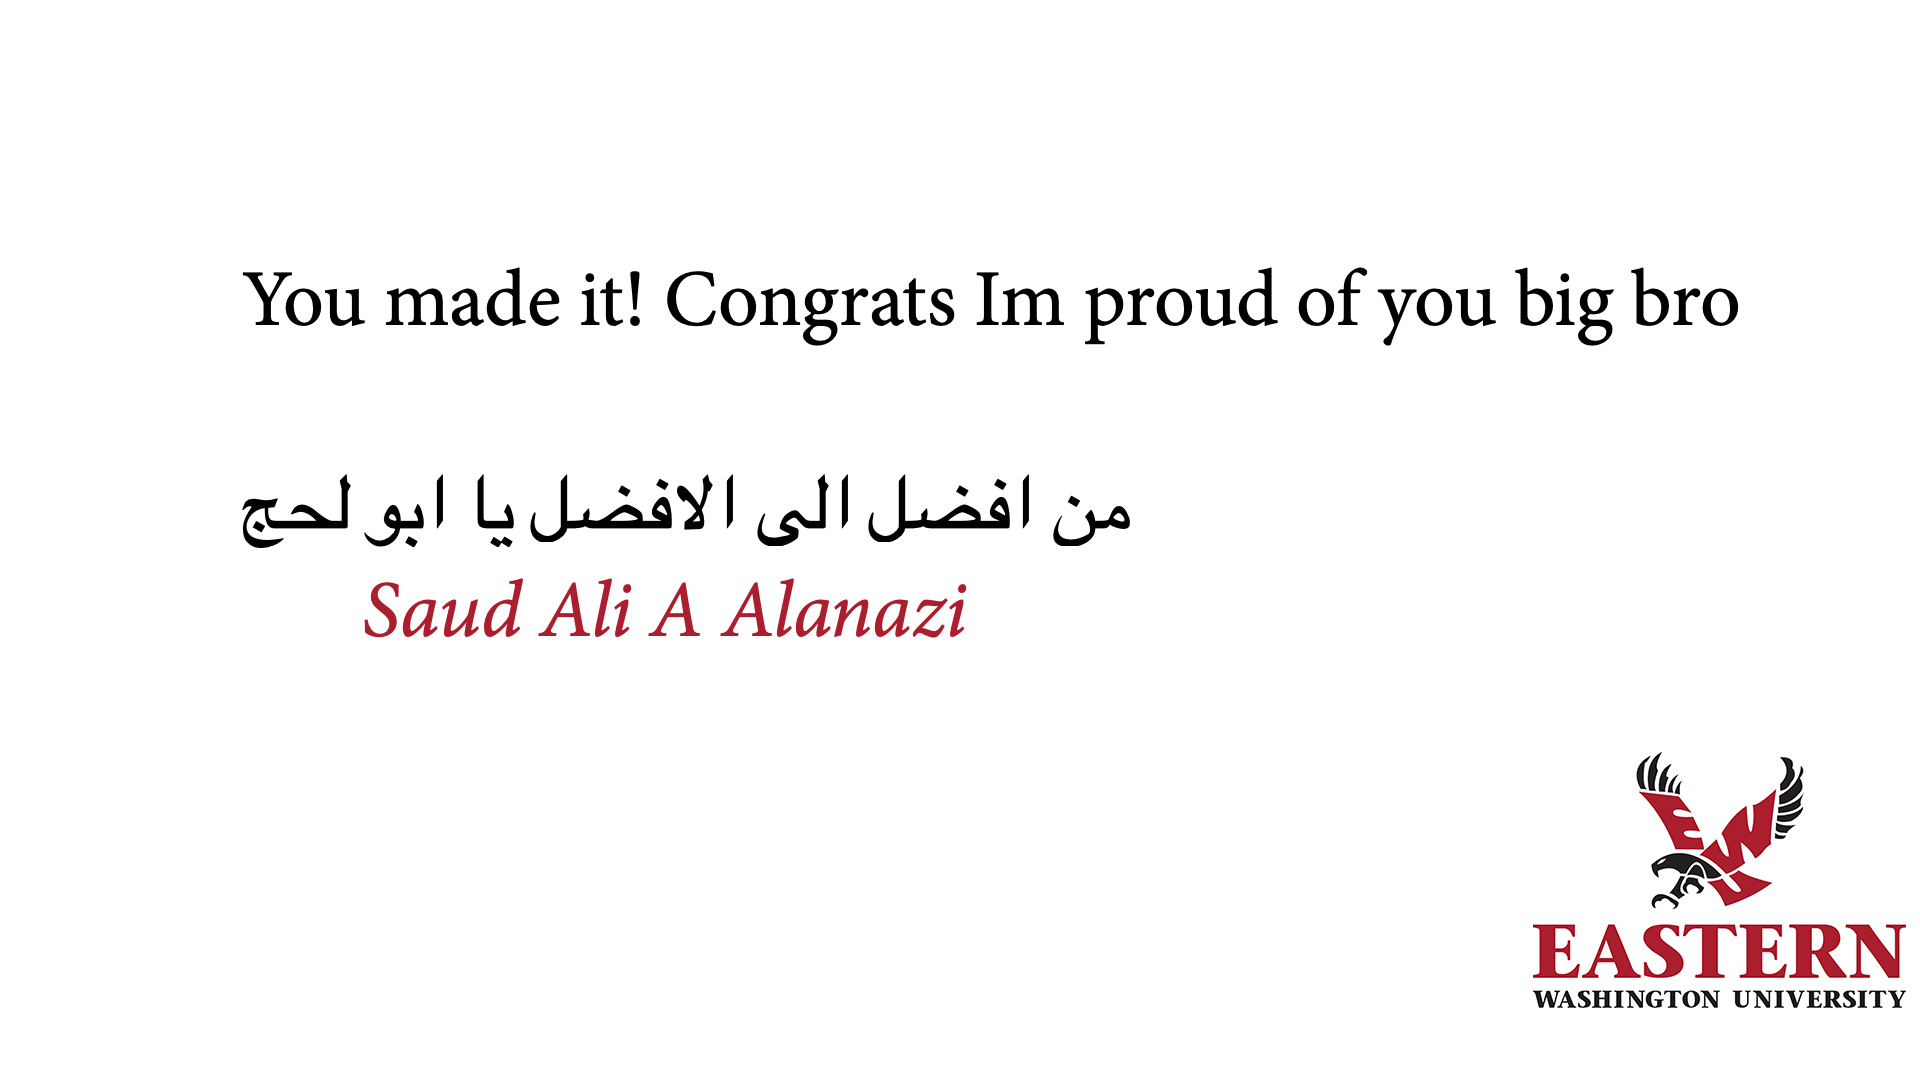 tbi_abdulwahab-ali-a-alanazi_7099.png